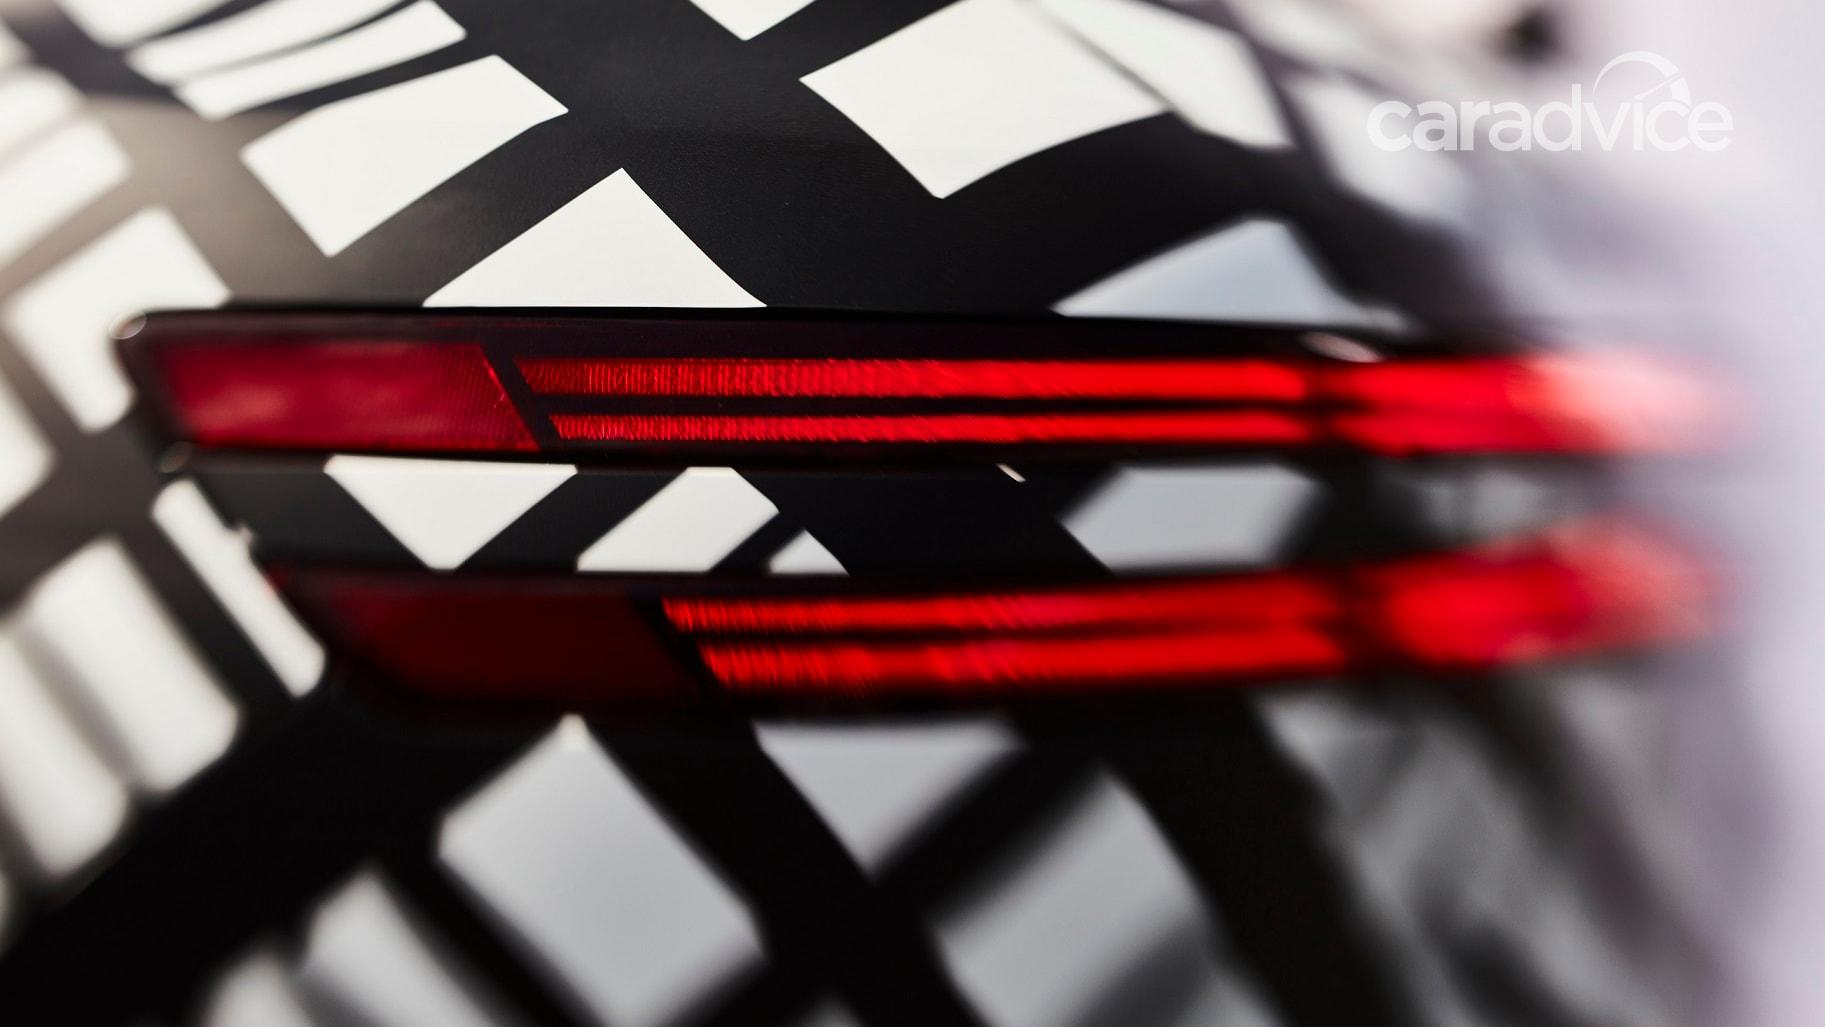 2021 Genesis GV70 previewed: Teasers, spy photos   CarAdvice